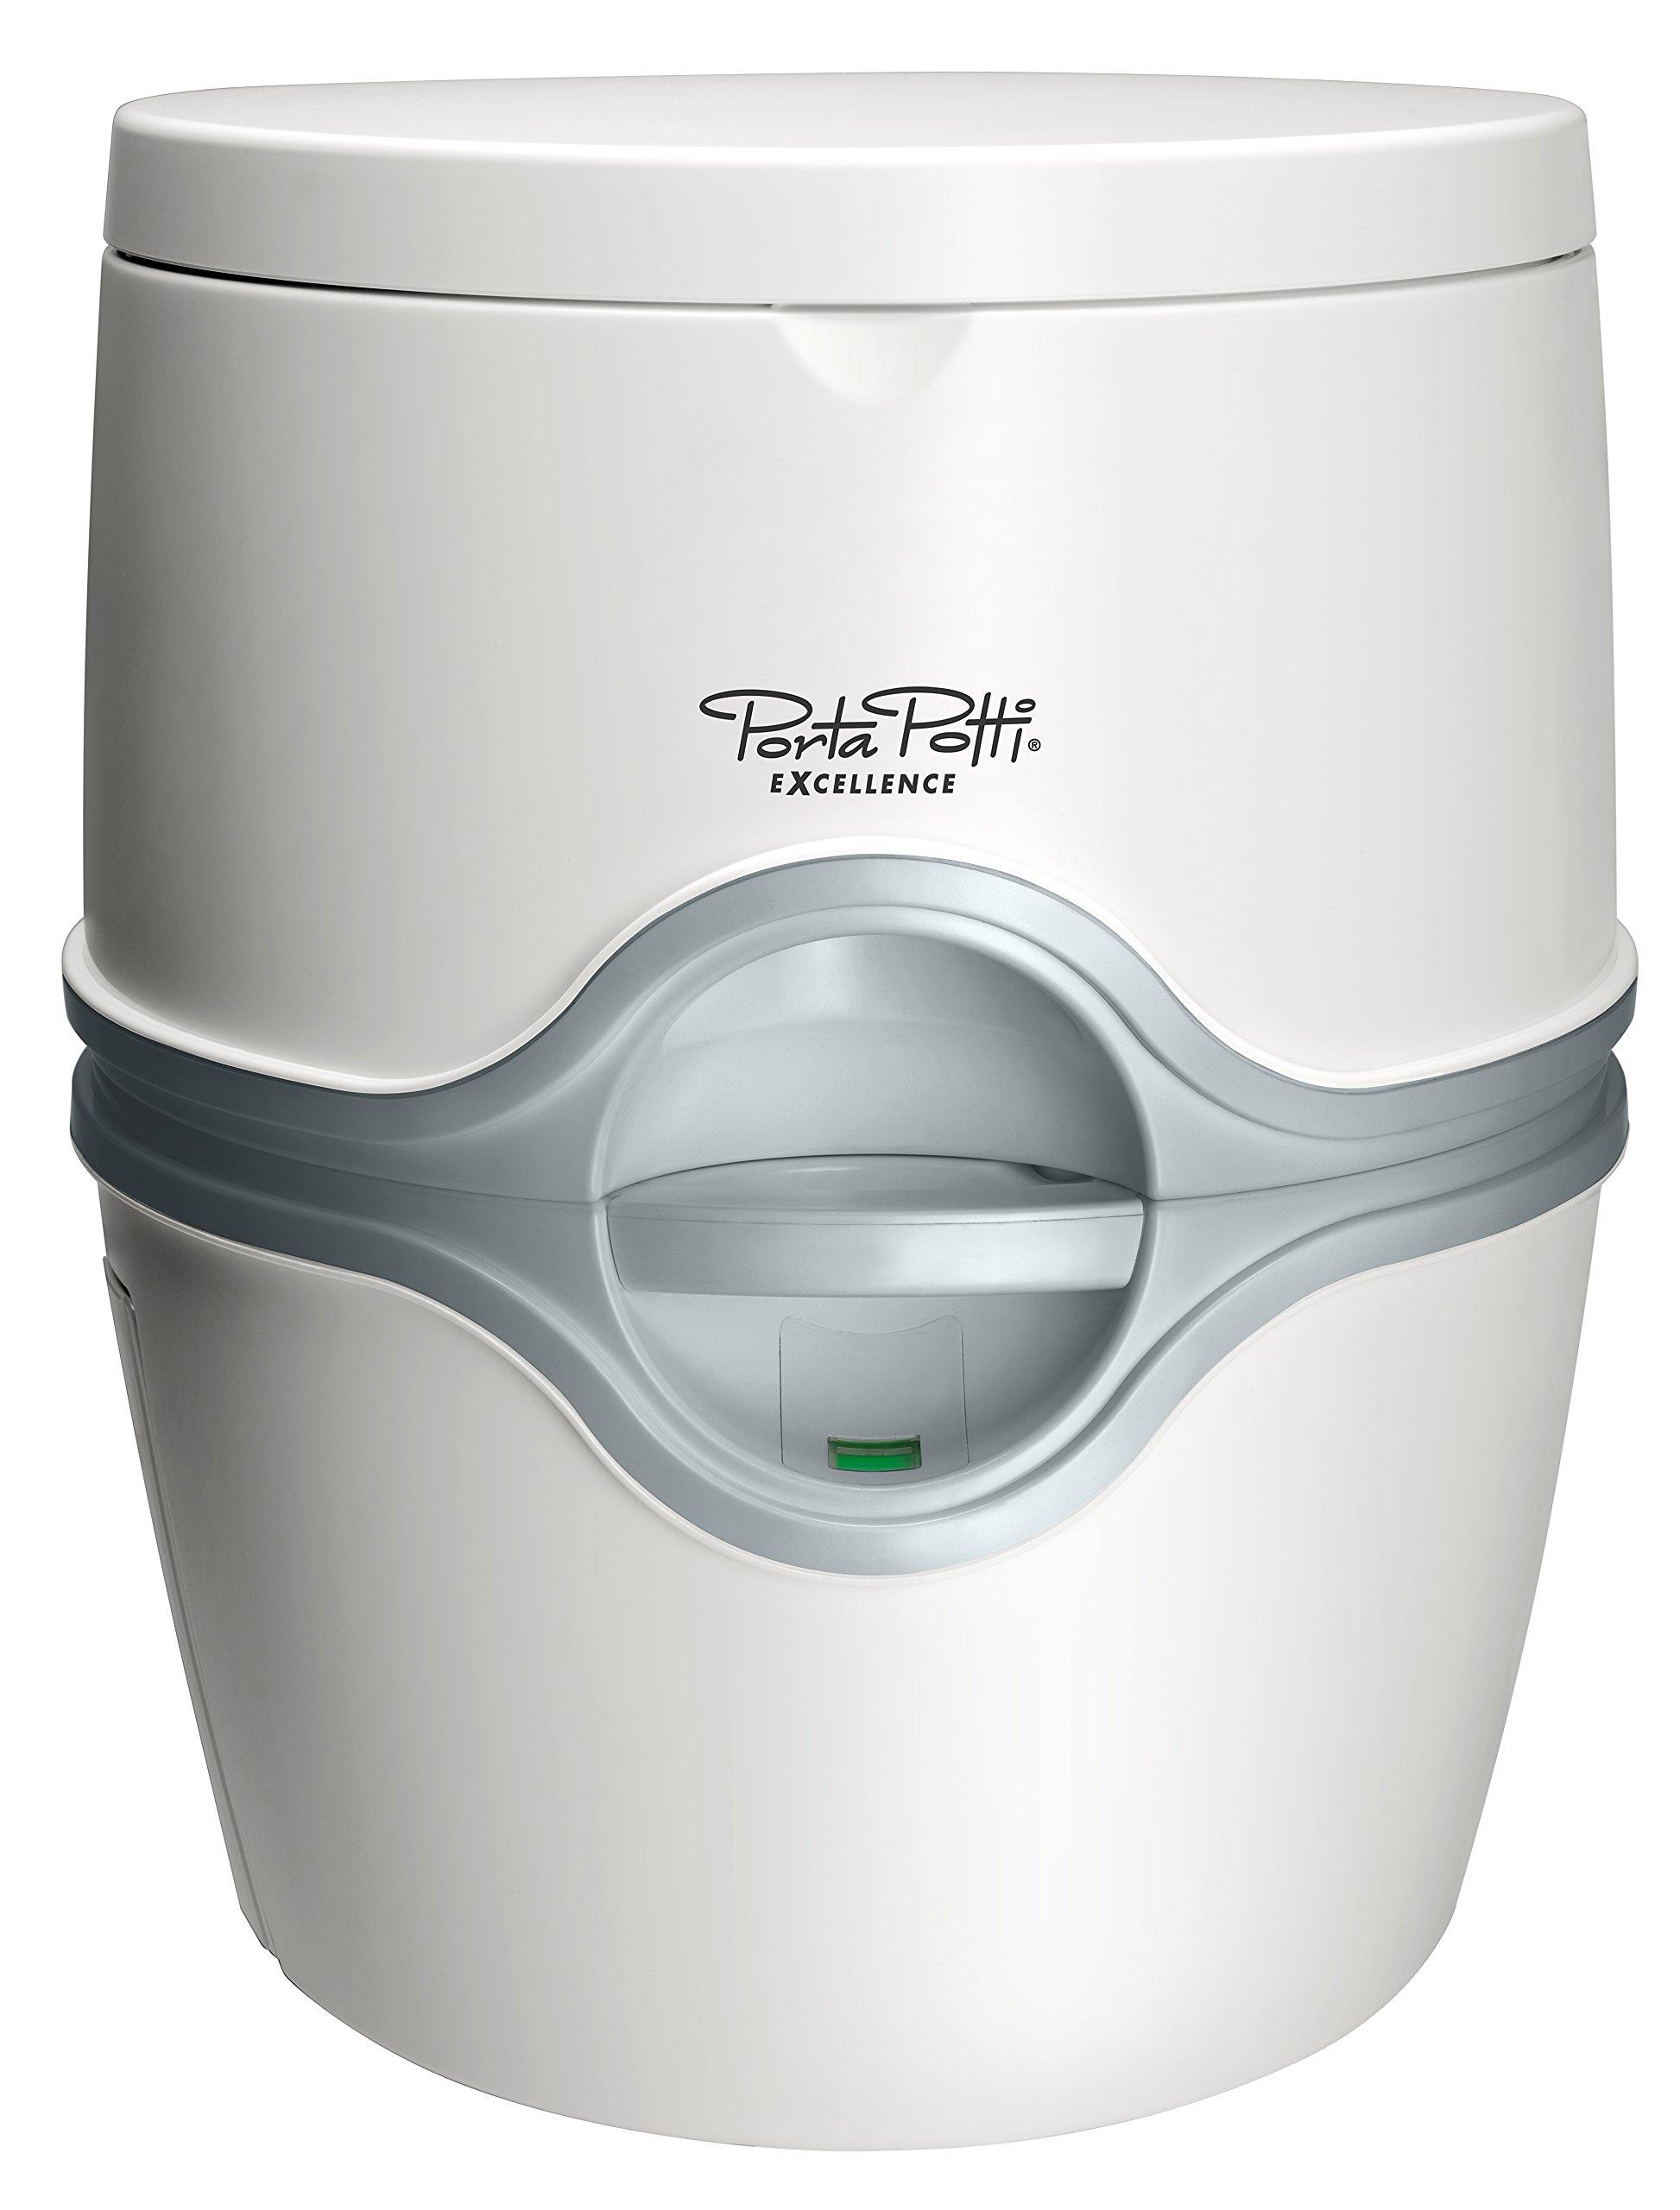 Thetford 92305 Porta Potti 565P Excellence Portable Toilet (Manual), 448 x 388 x 450 mm 2